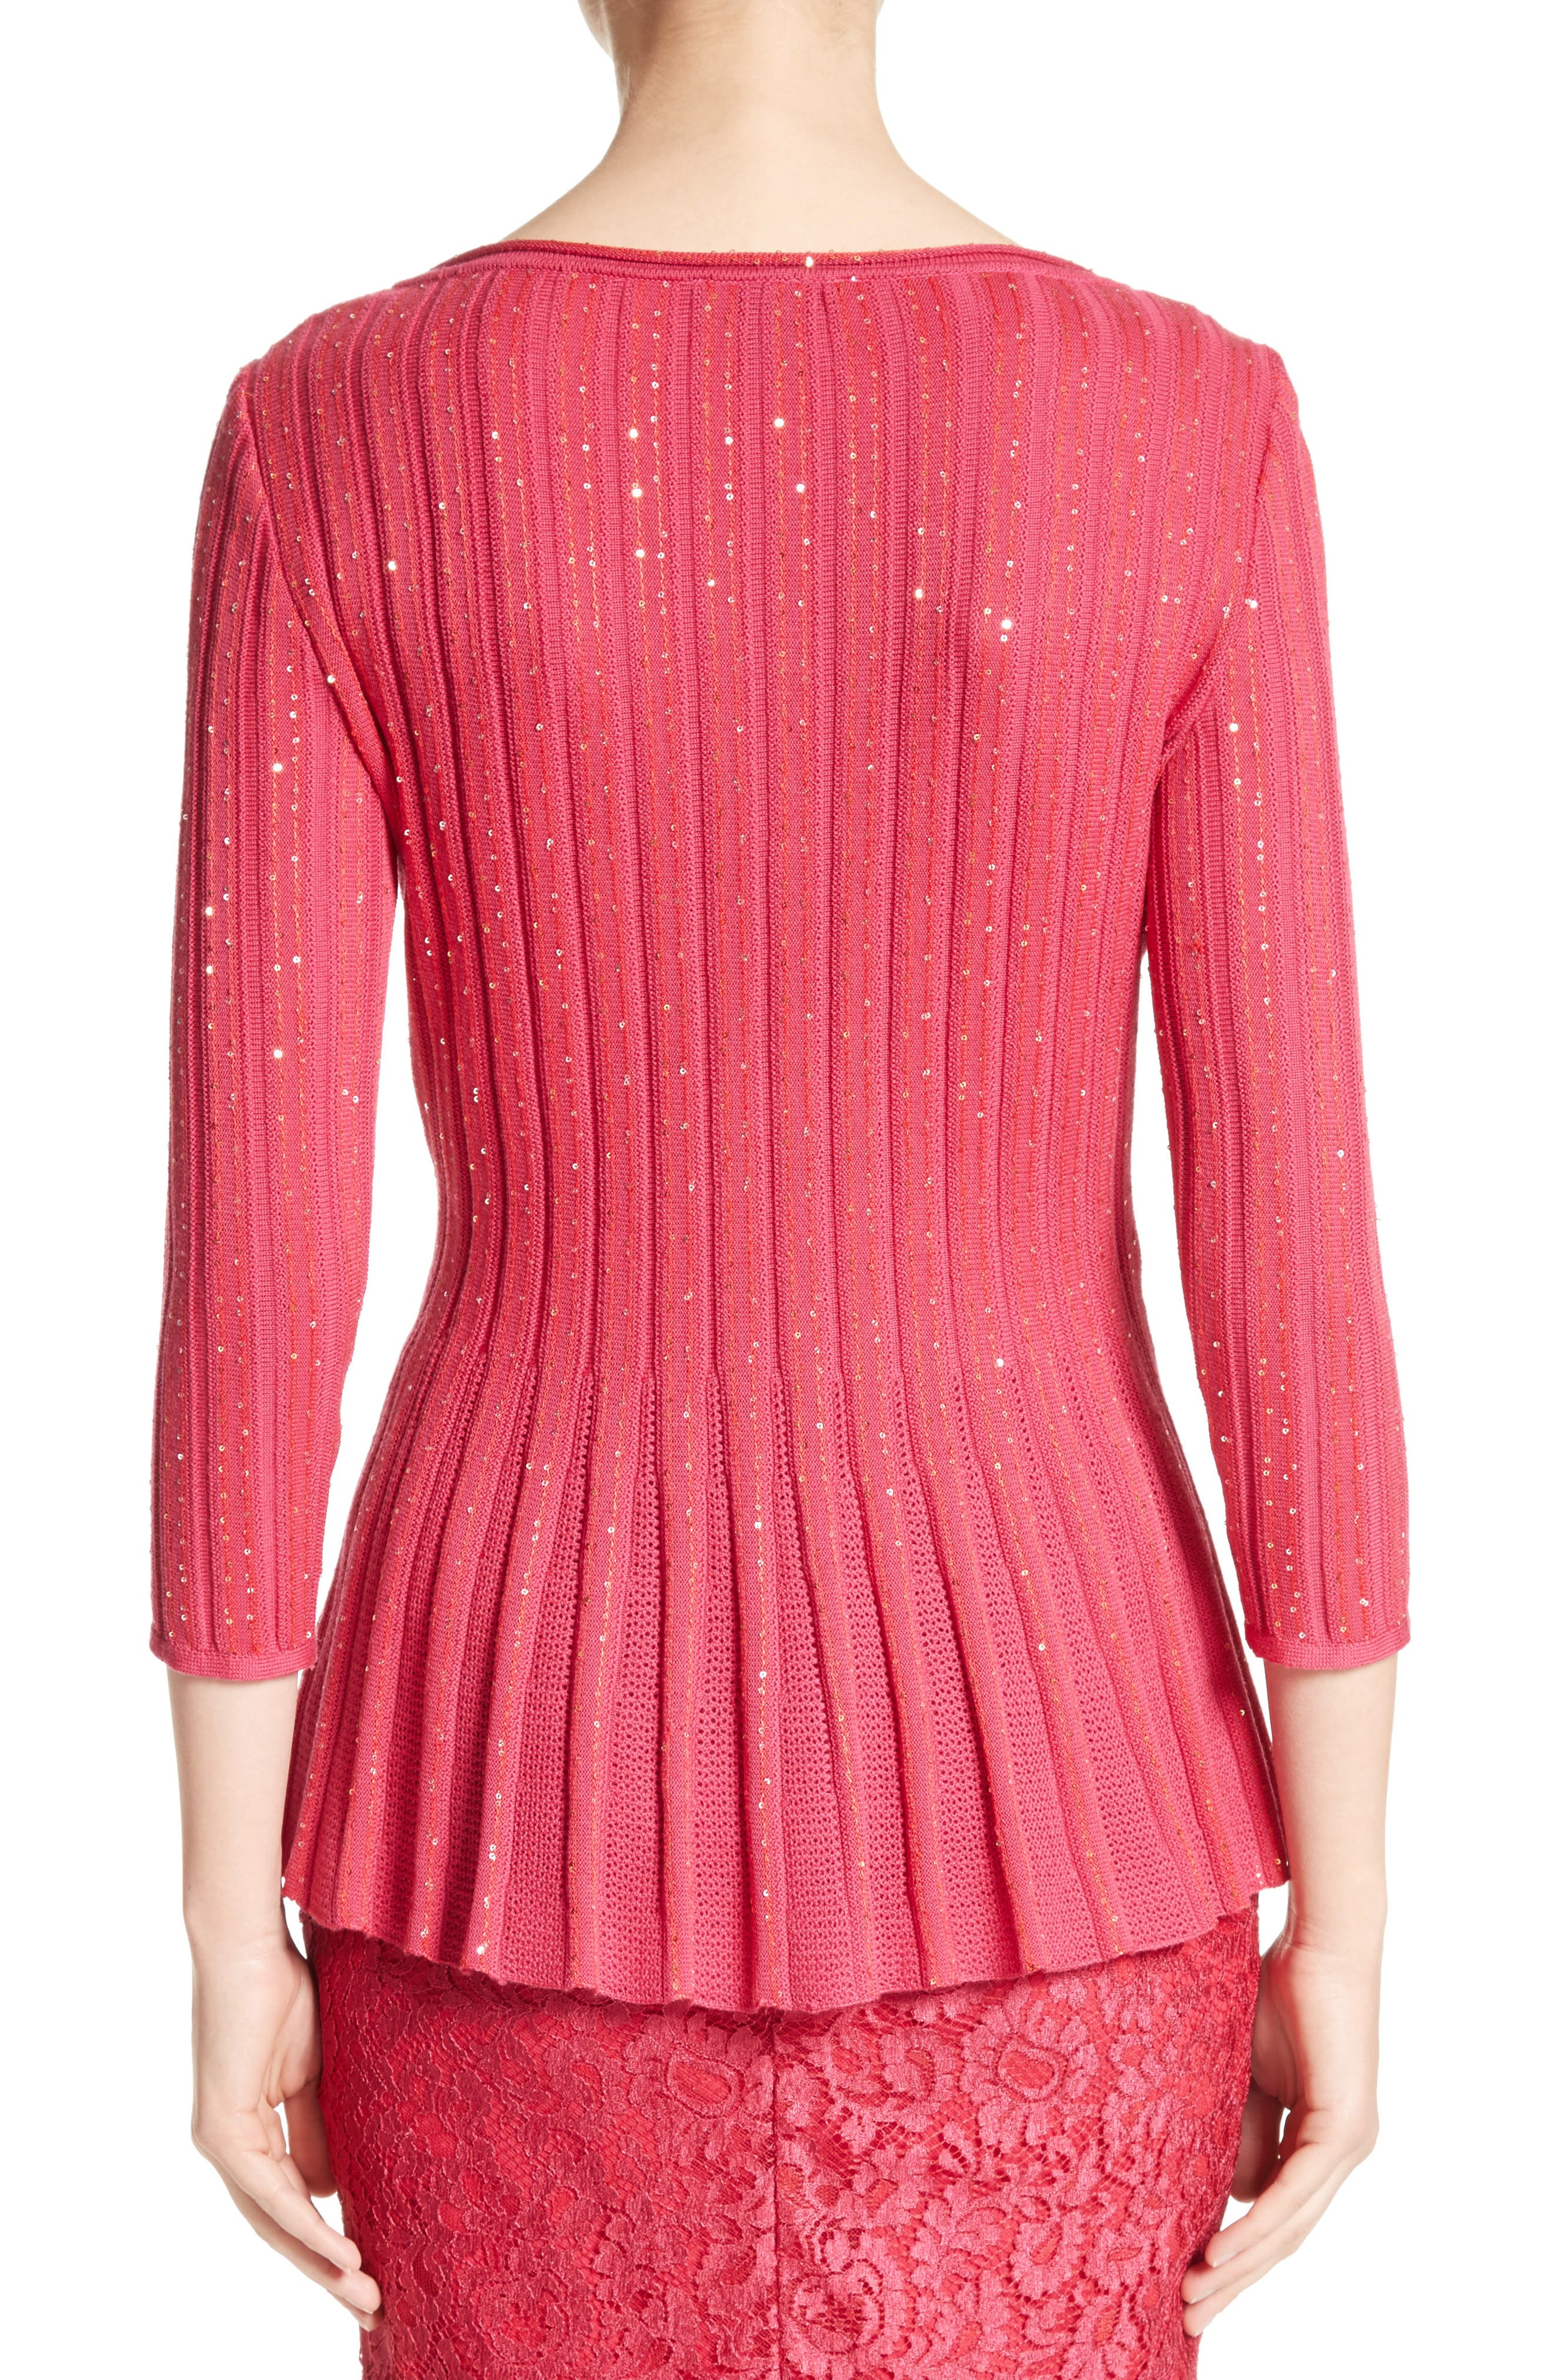 Chriag Sequin Knit Peplum Top,                             Alternate thumbnail 2, color,